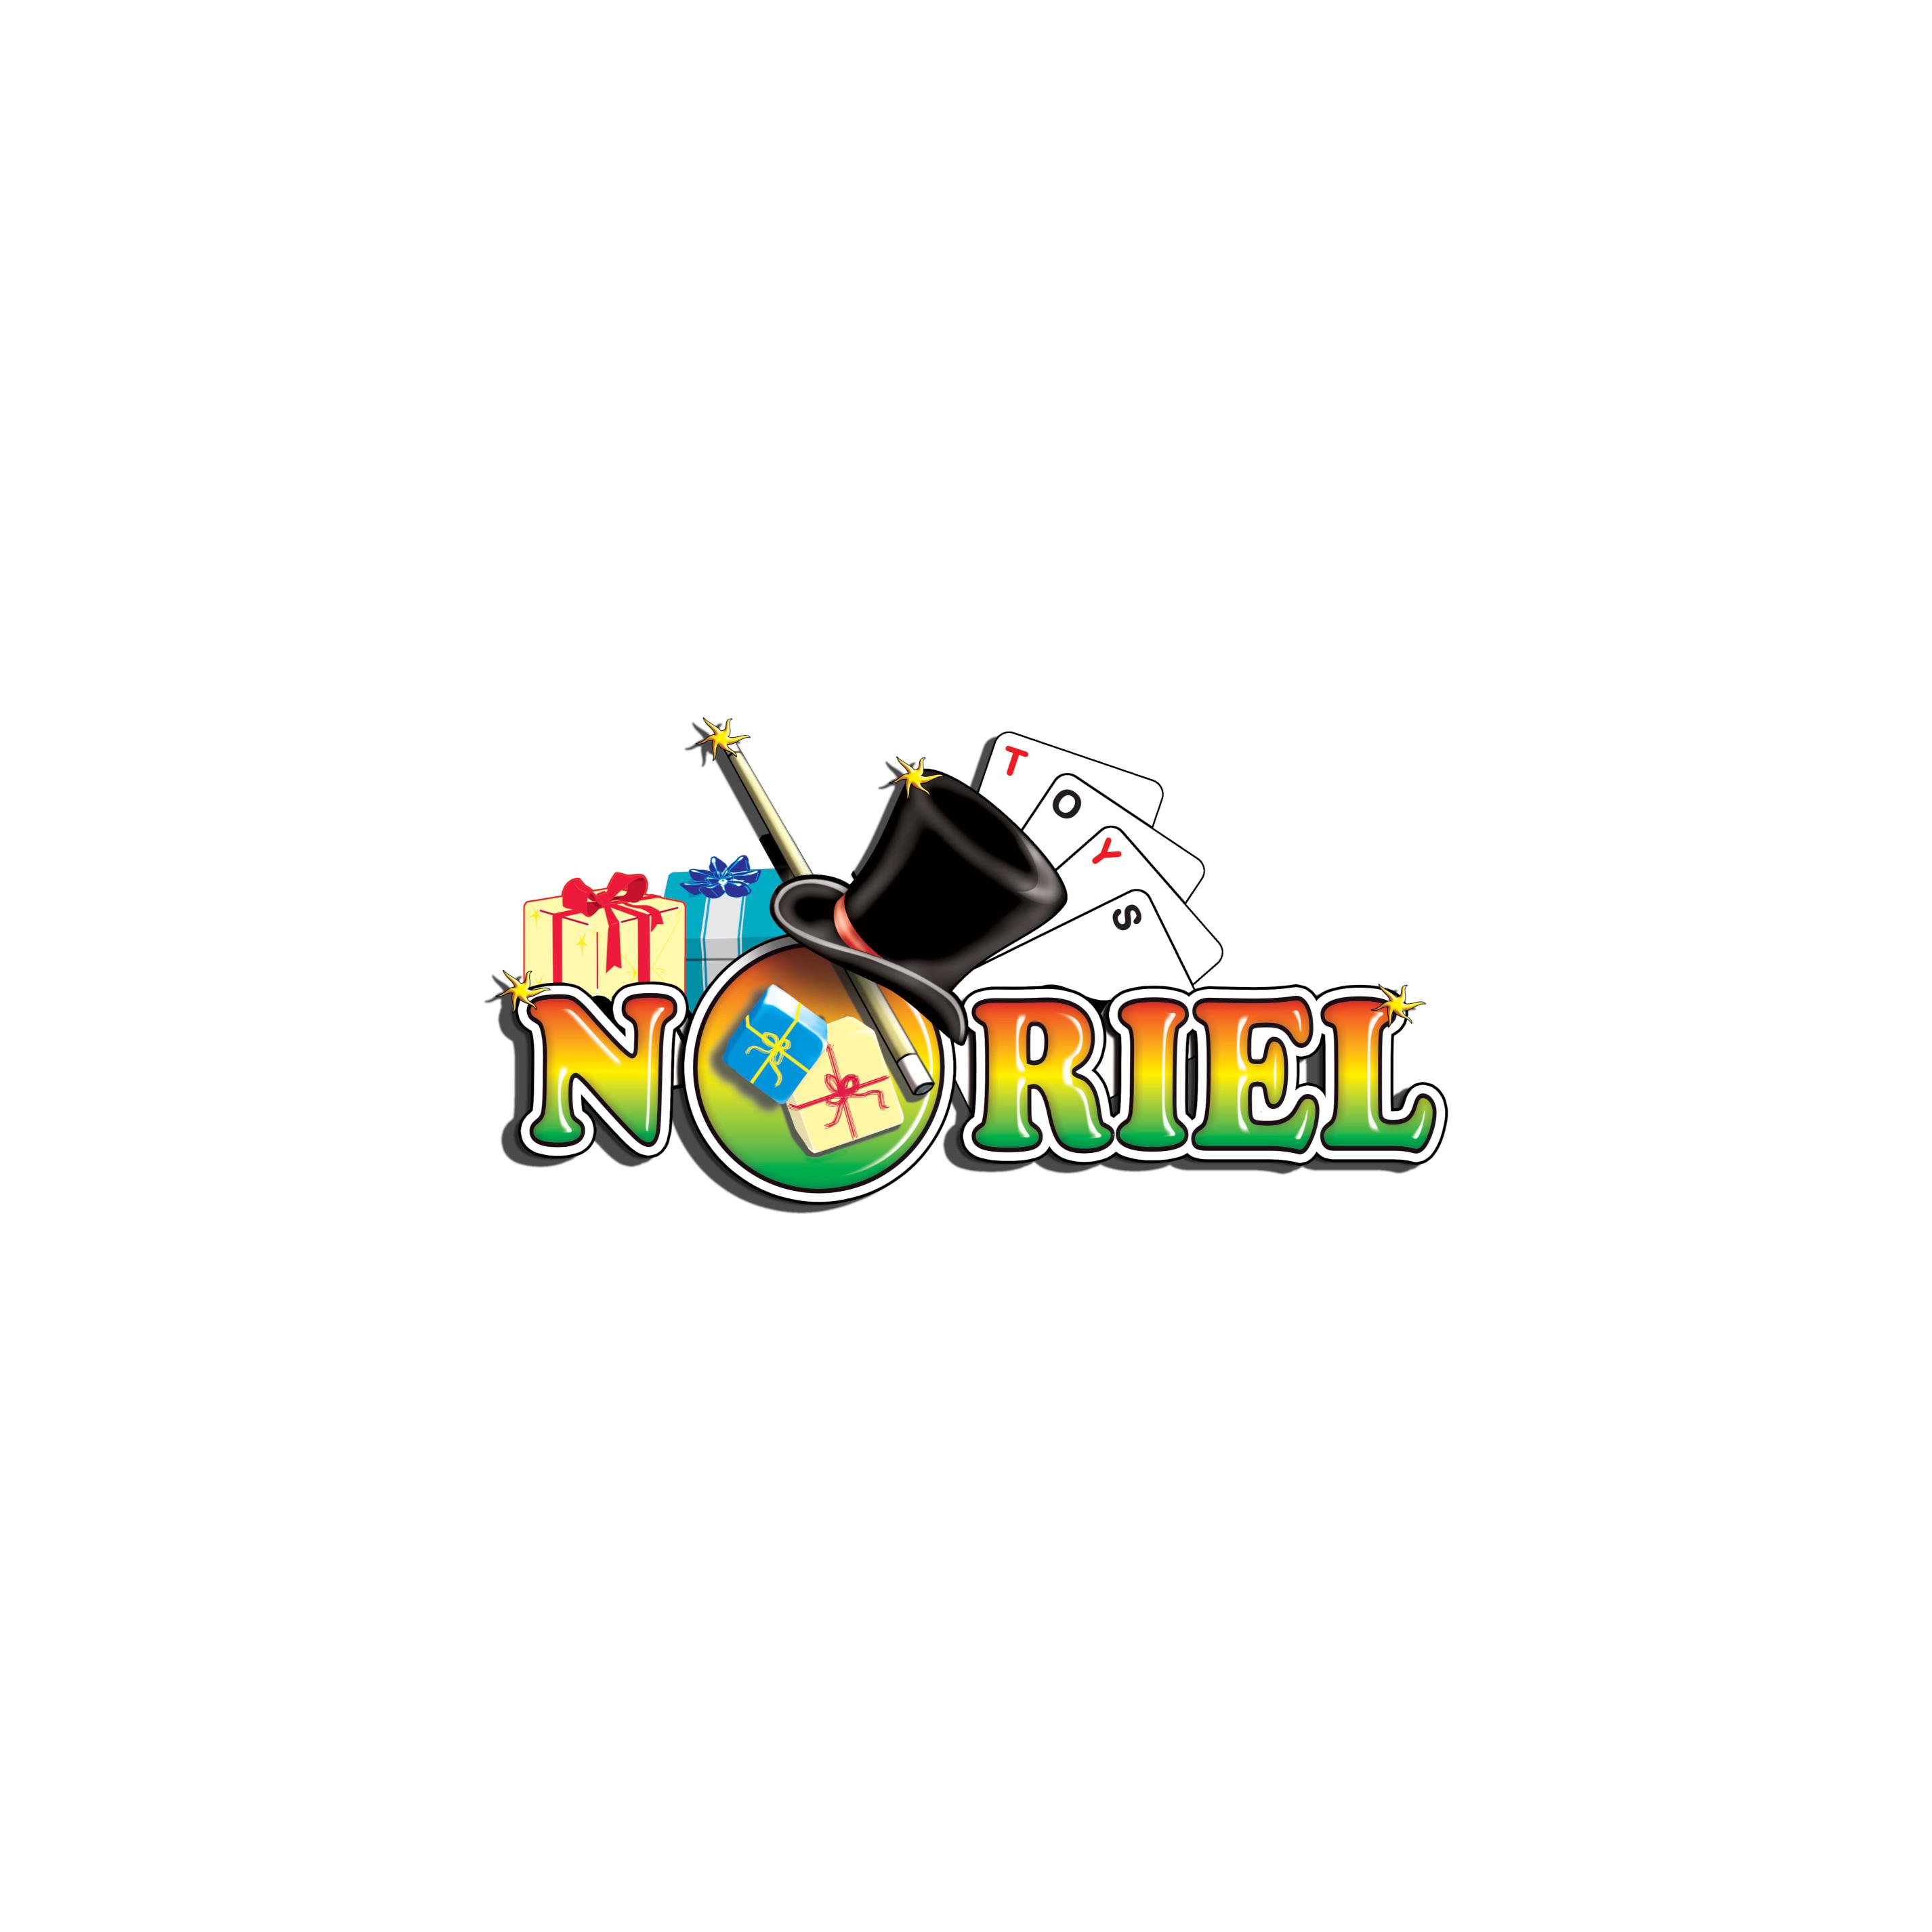 NOR4628_001w Mini Puzzle cu doua fete Noriel - Mare, Munte, 24 piese